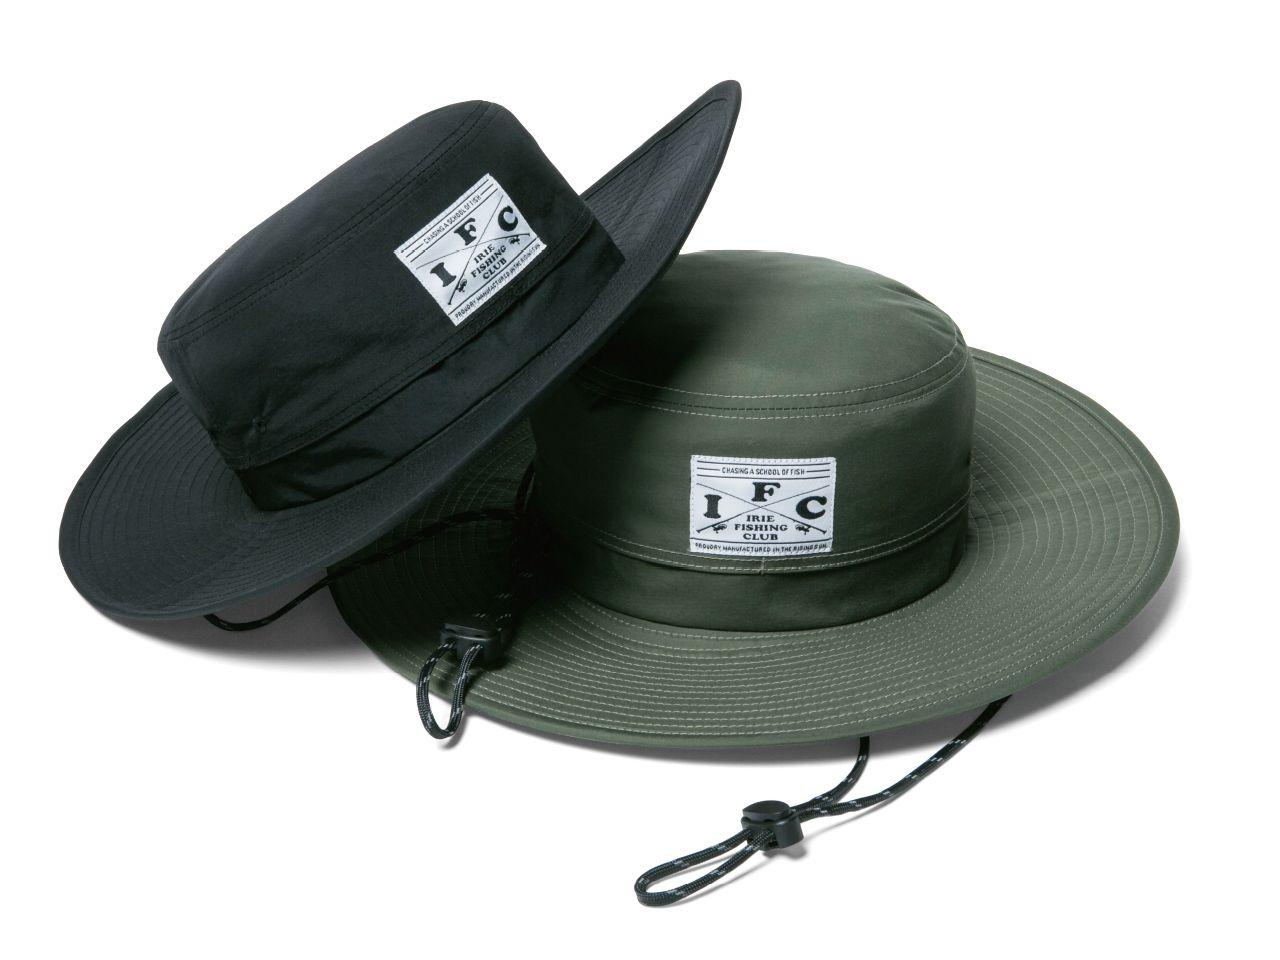 I.F.C 3LAYER HAT -IRIE FISHING CLUB-